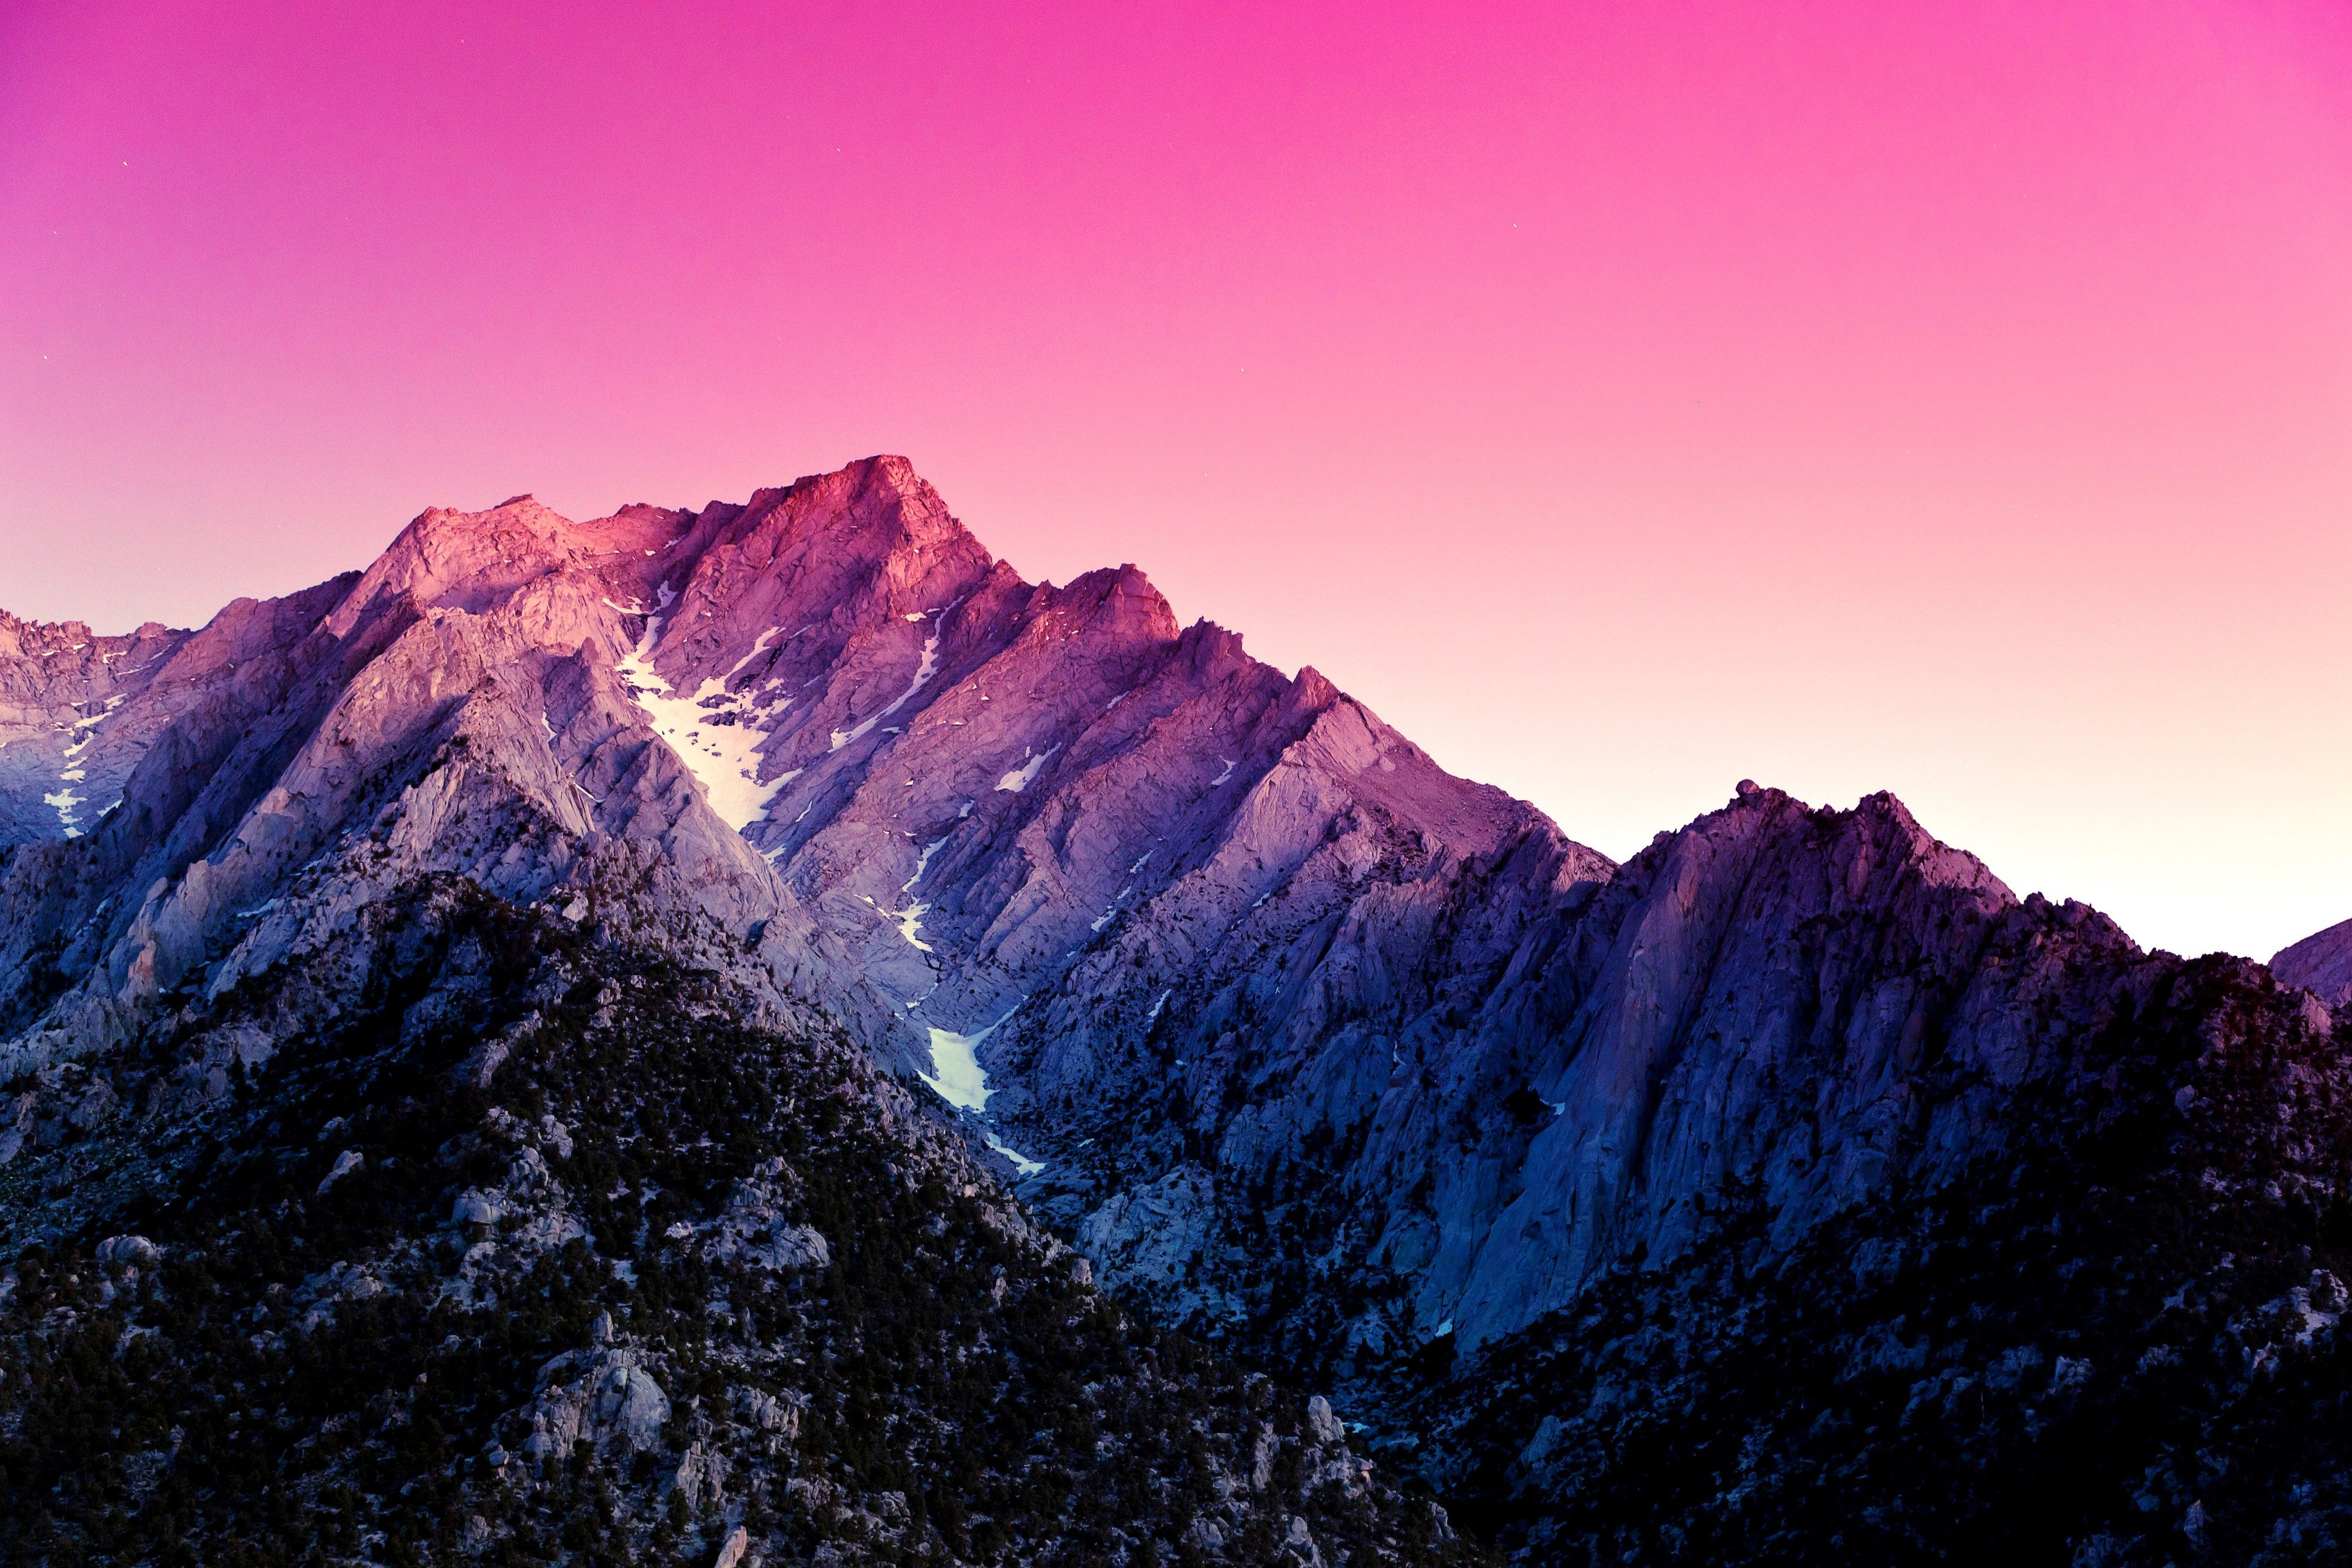 Download LG Nexus 5 Stock Wallpapers Mountain wallpaper